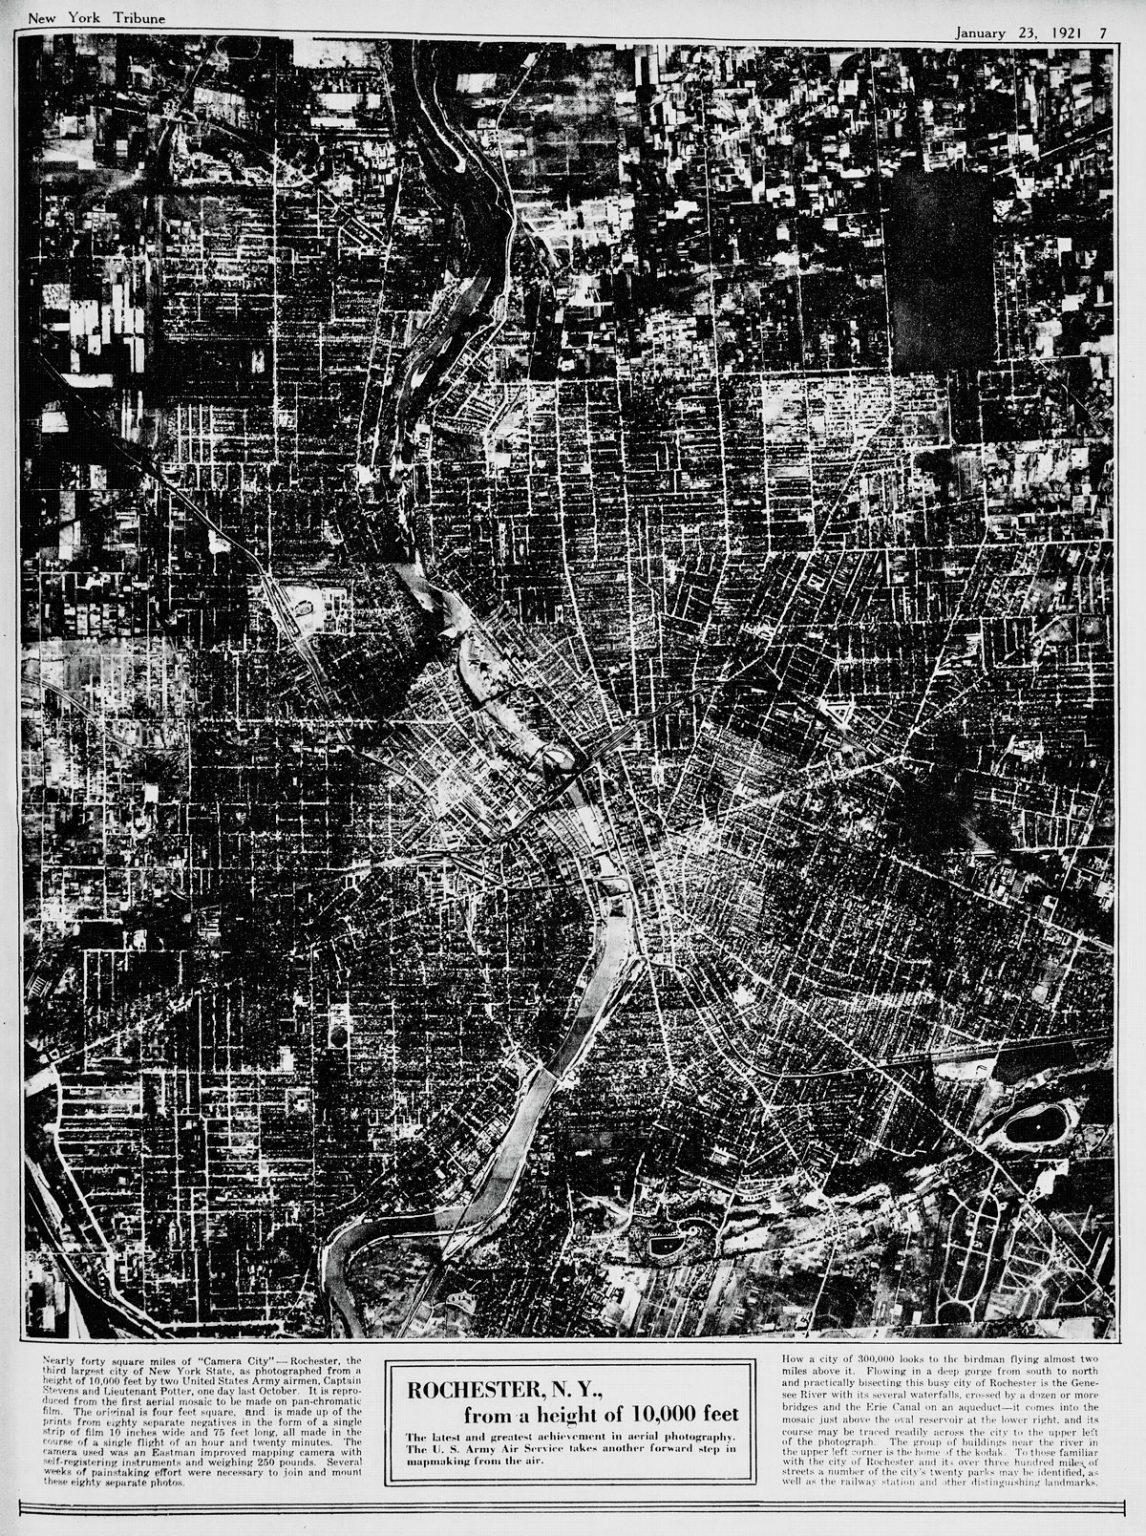 Rochester, New York from 10,000 feet (1921)